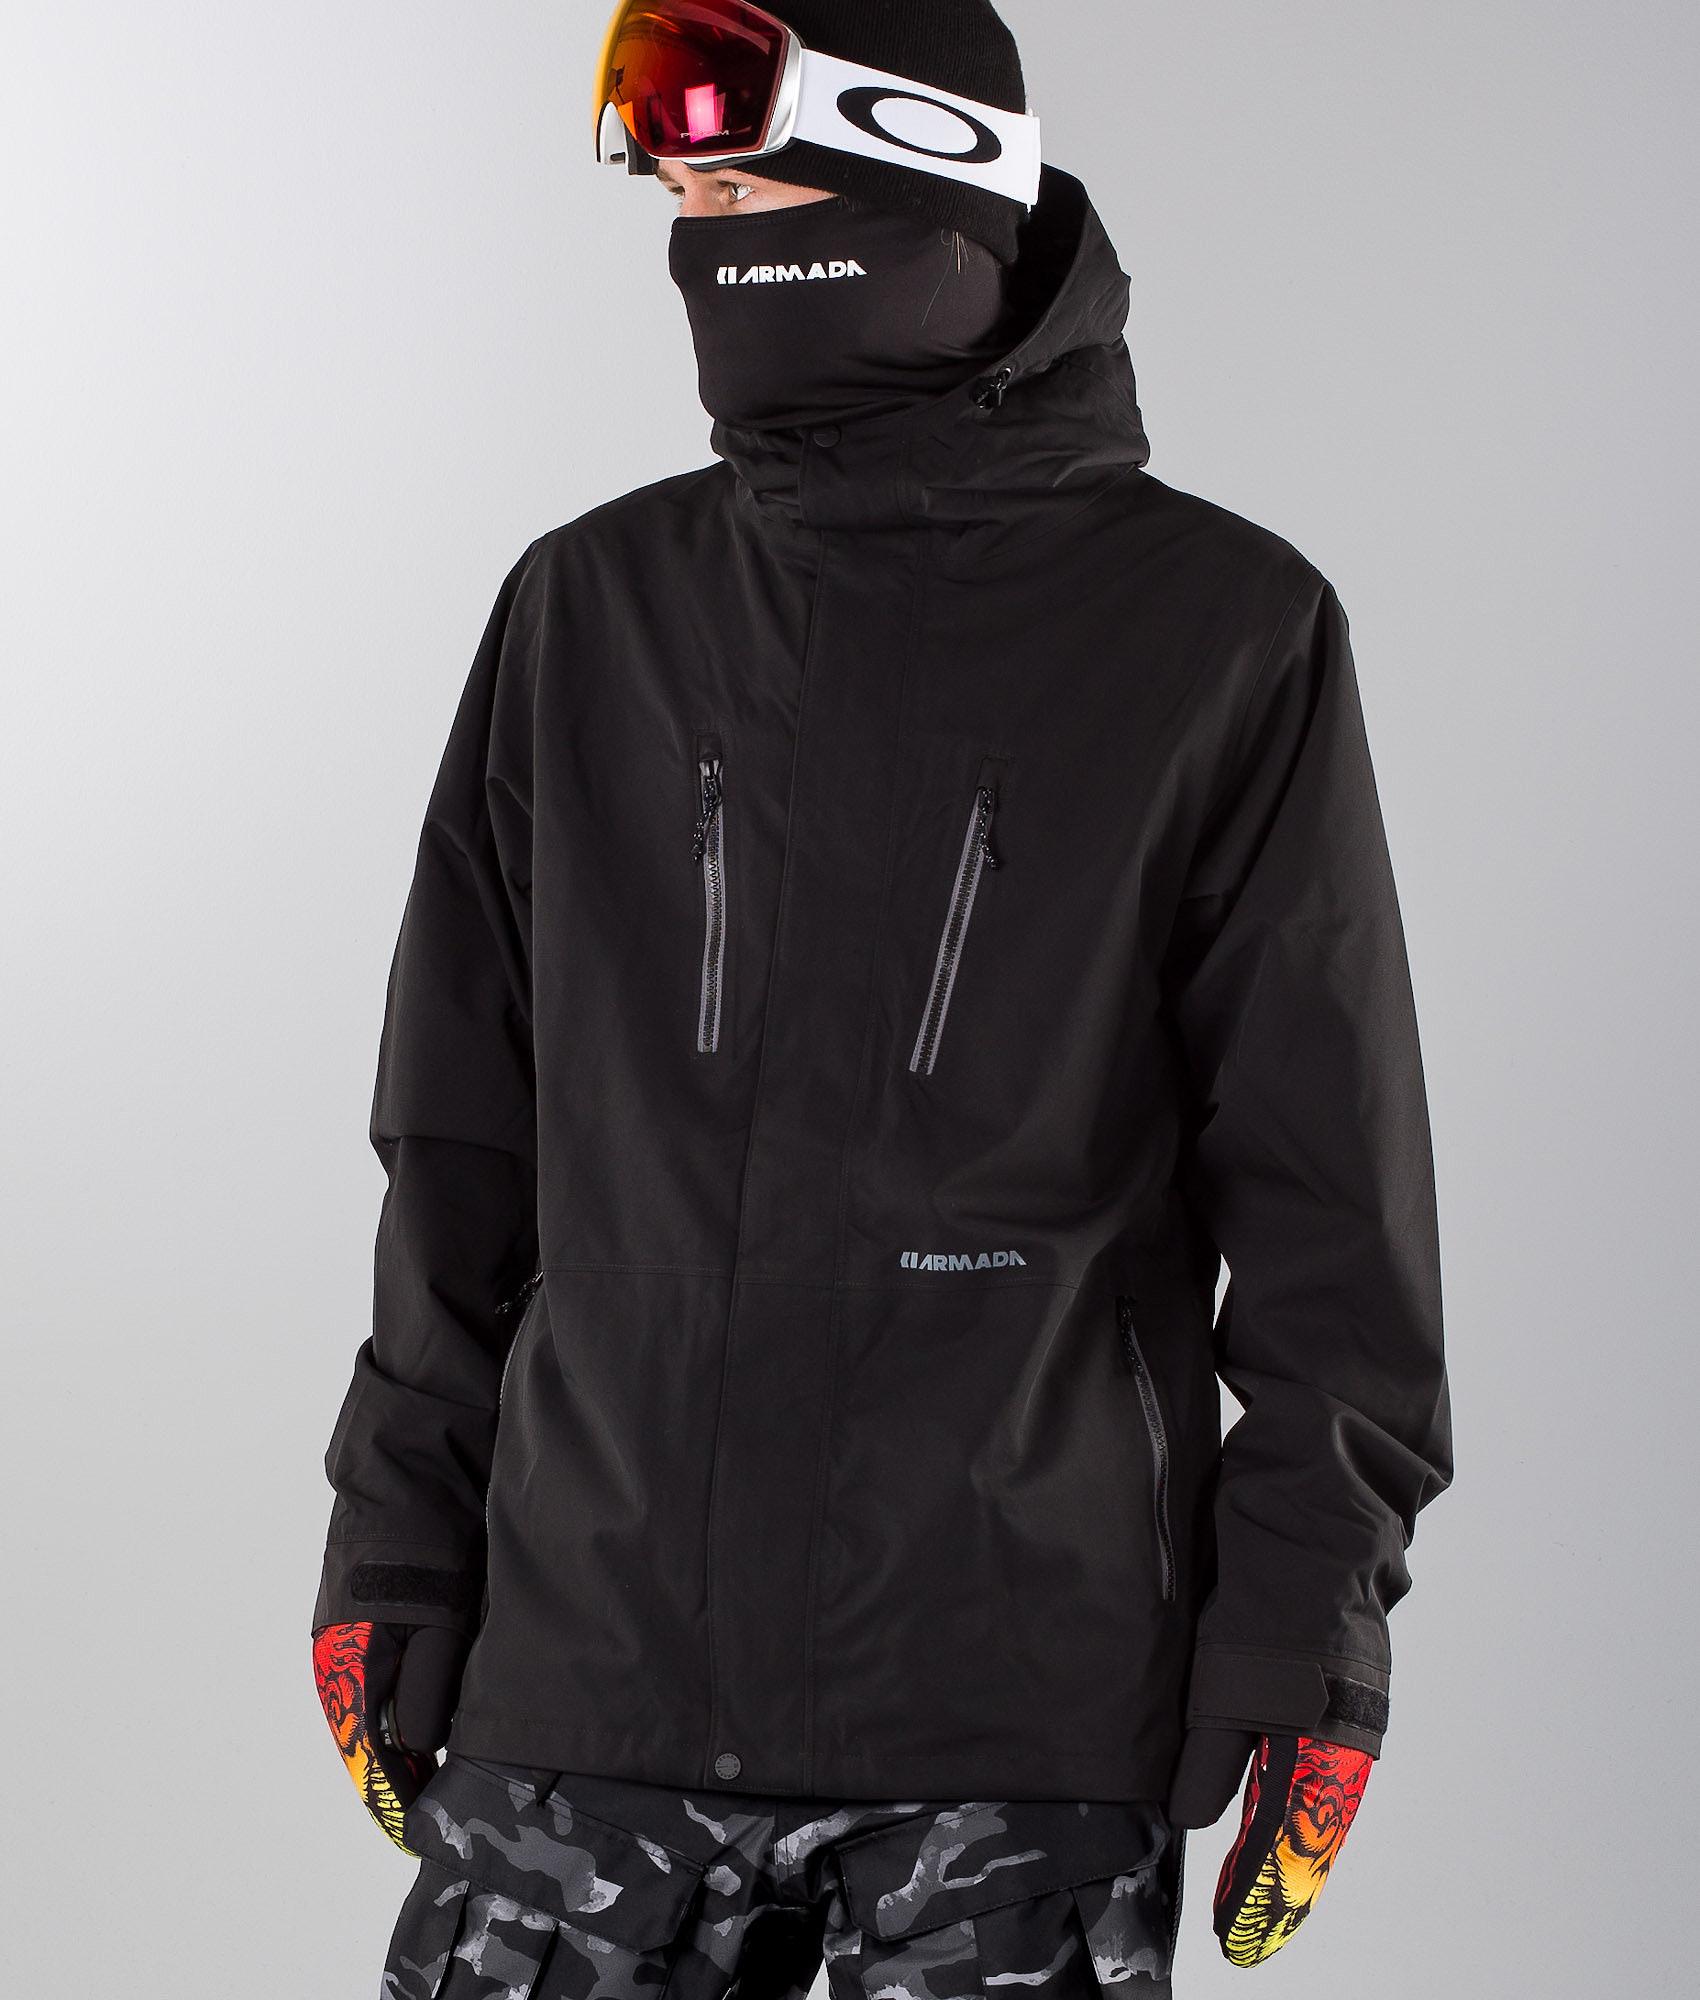 ce79def499 Armada Aspect Ski Jacket Black - Ridestore.com